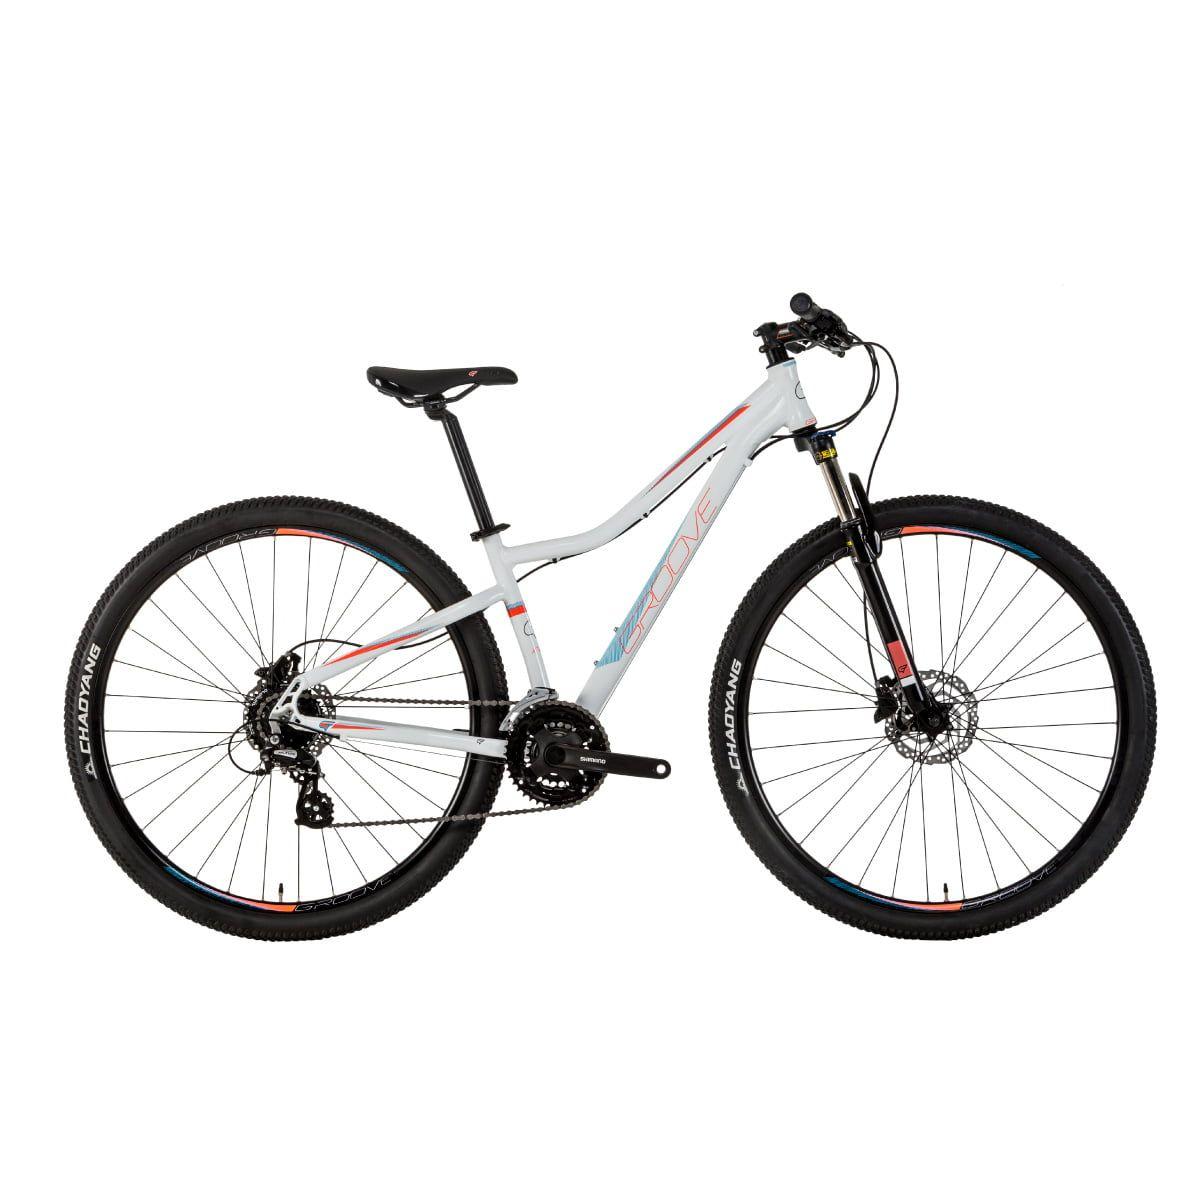 Bicicleta Groove Indie 2019 Aro 29 Hidráulico 21V Branca